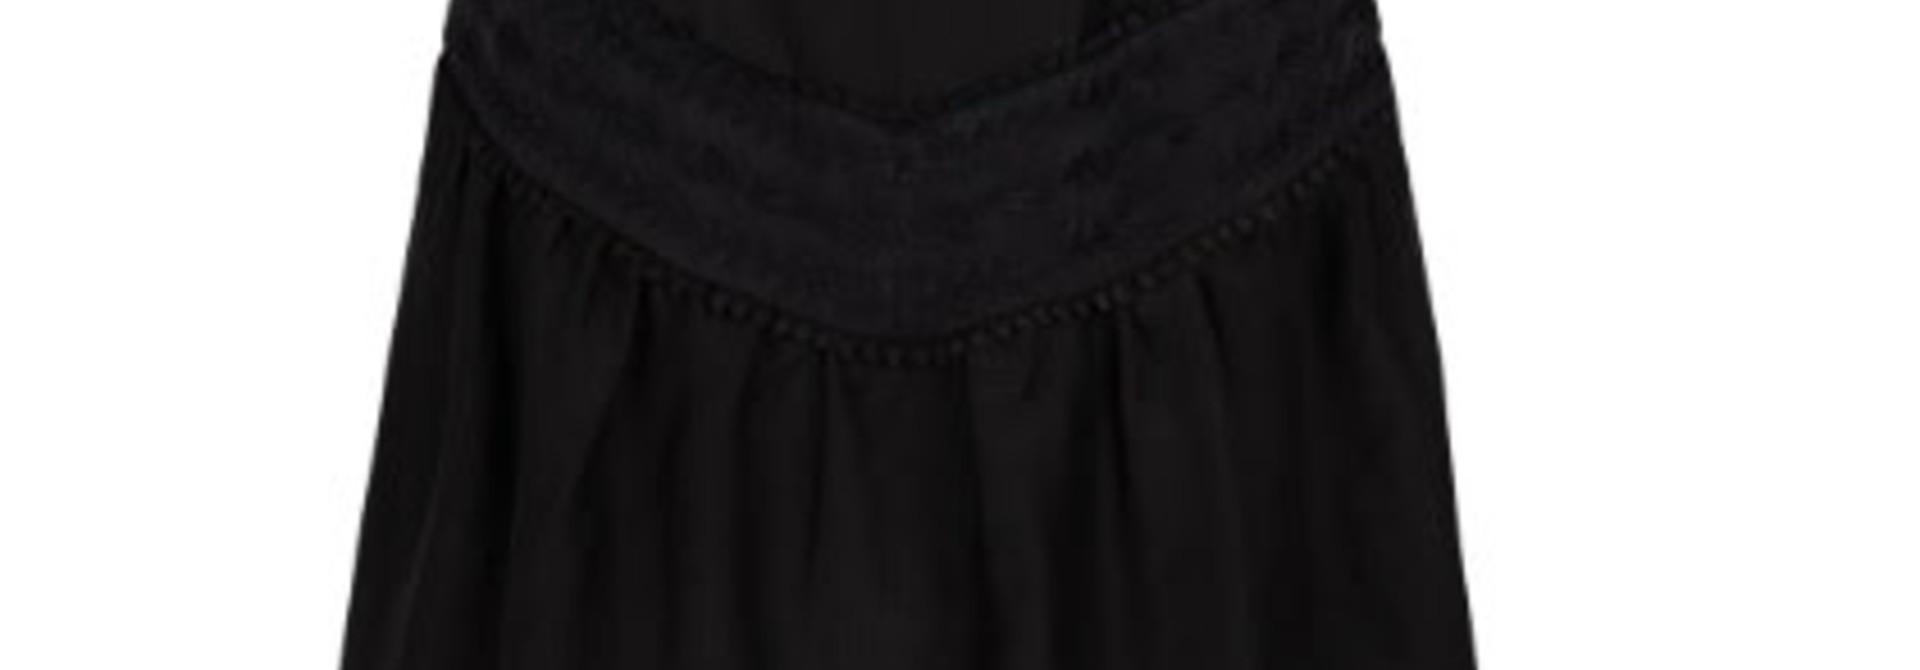 Loubi embroidery skirt raven